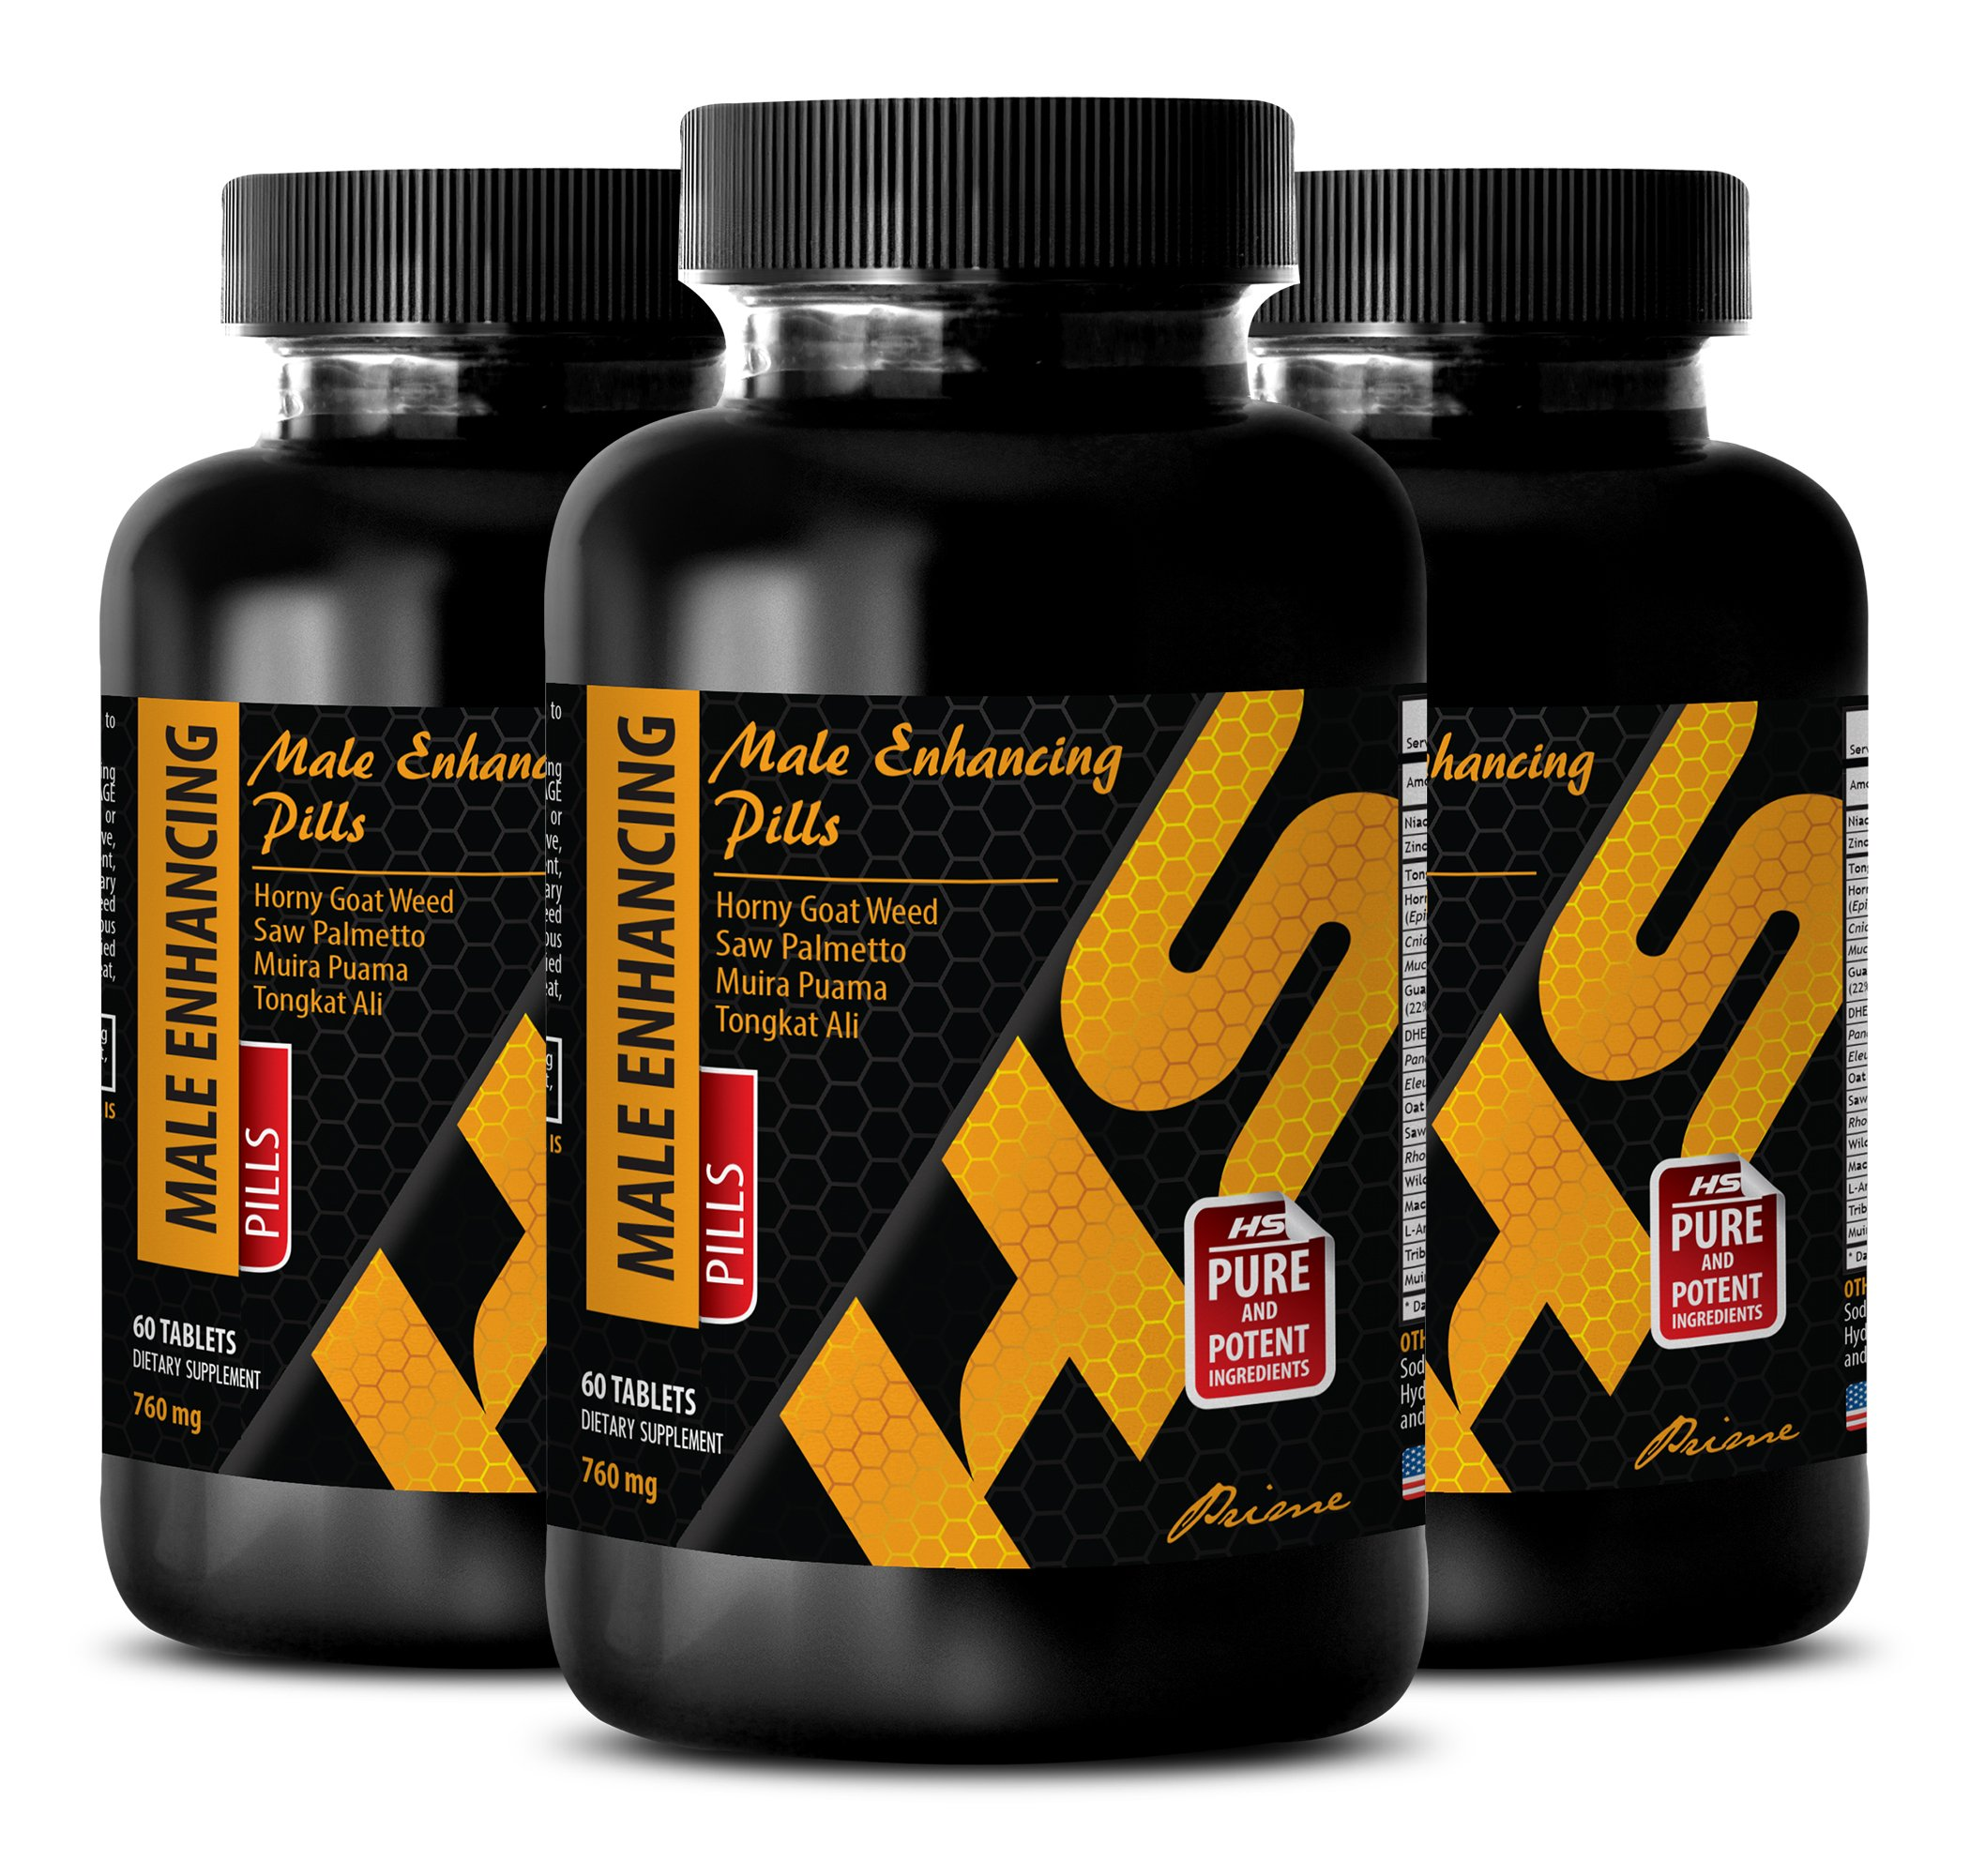 male libido enhancement - MALE ENHANCING PILLS 760 MG - black maca capsules - 3 Bottles (180 Tablets)